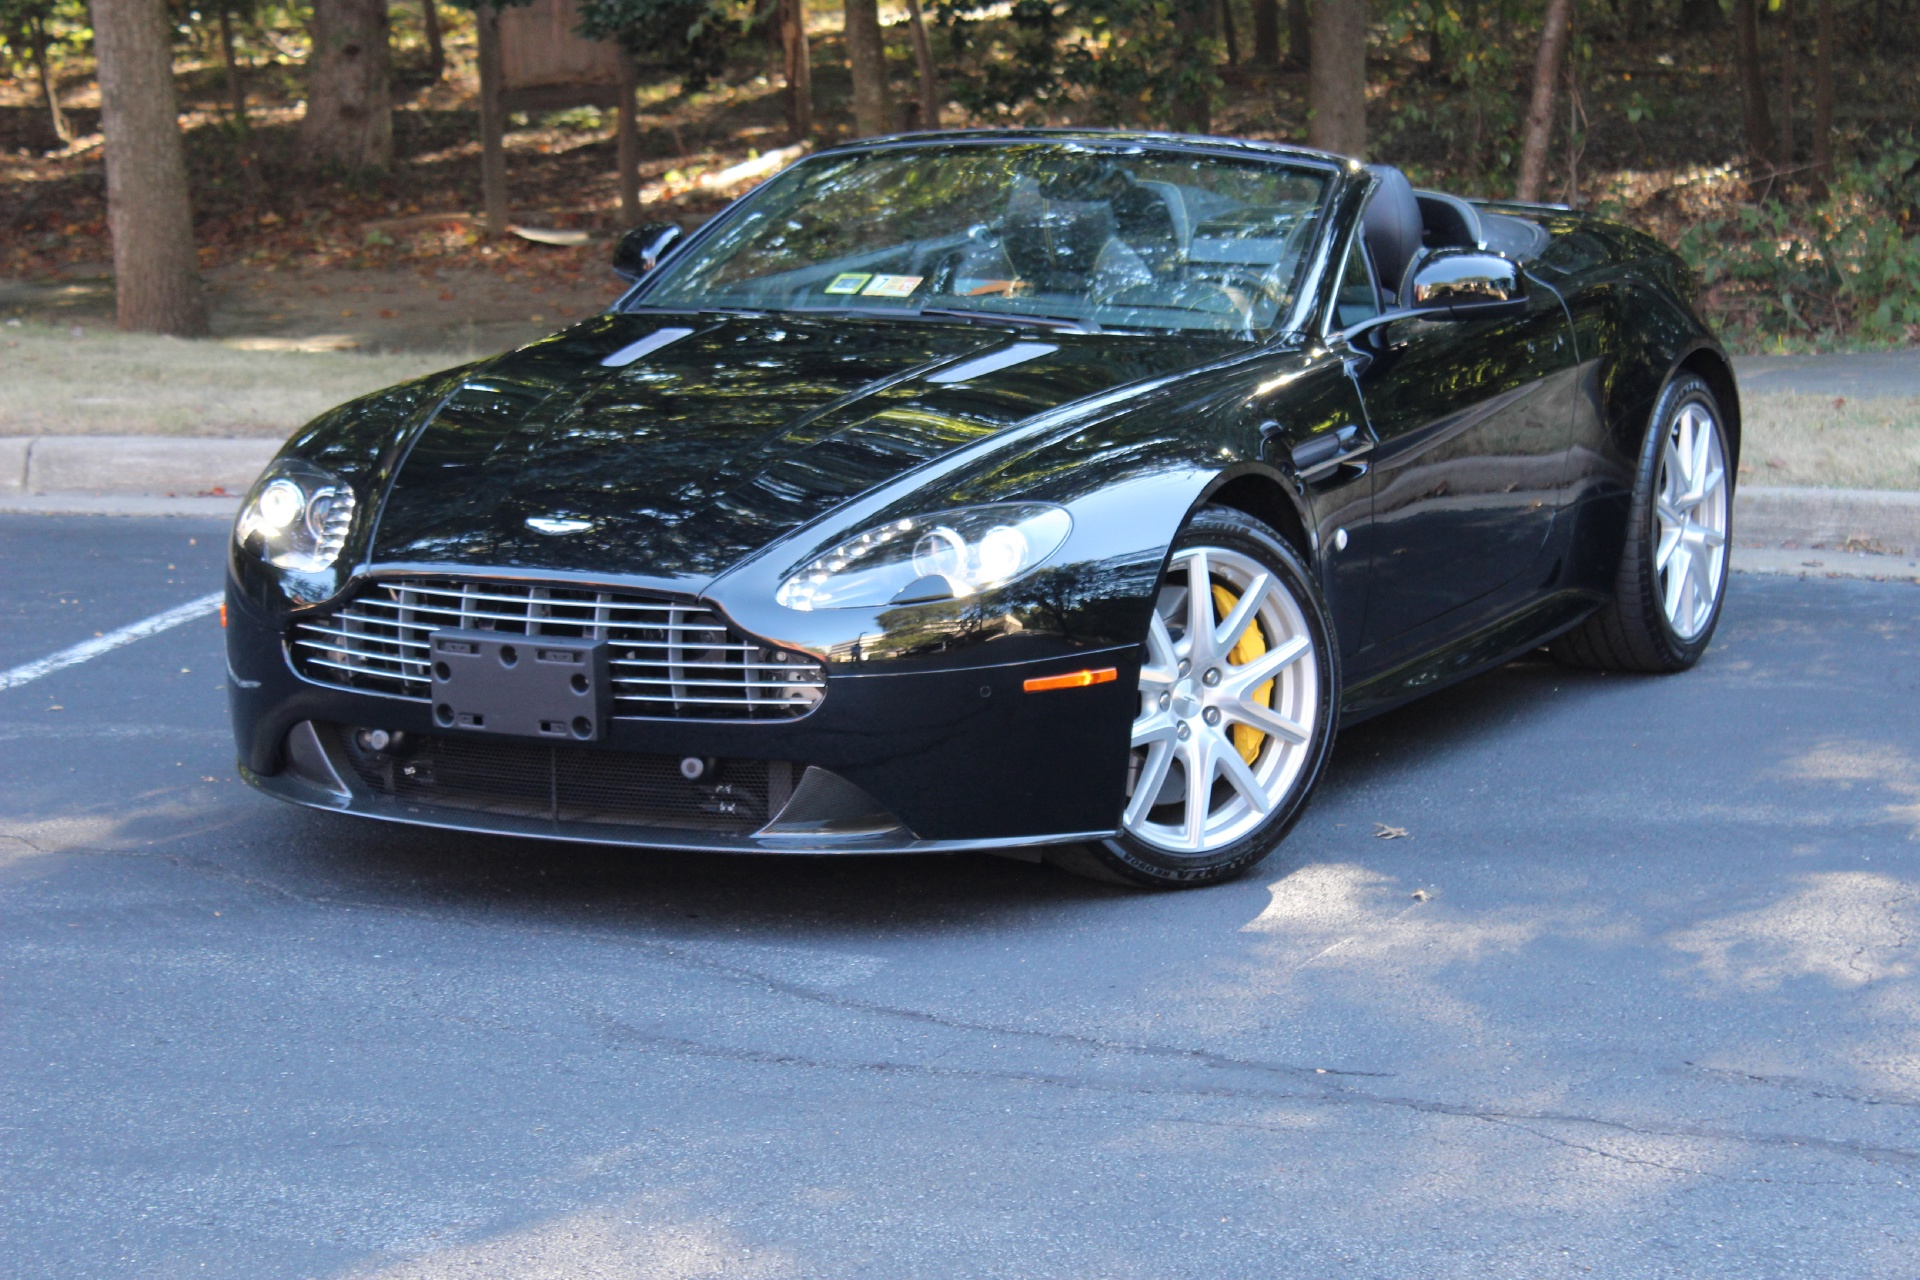 Aston Martin V Vantage S Roadster Stock PD For Sale - Aston martin vantage v8 for sale